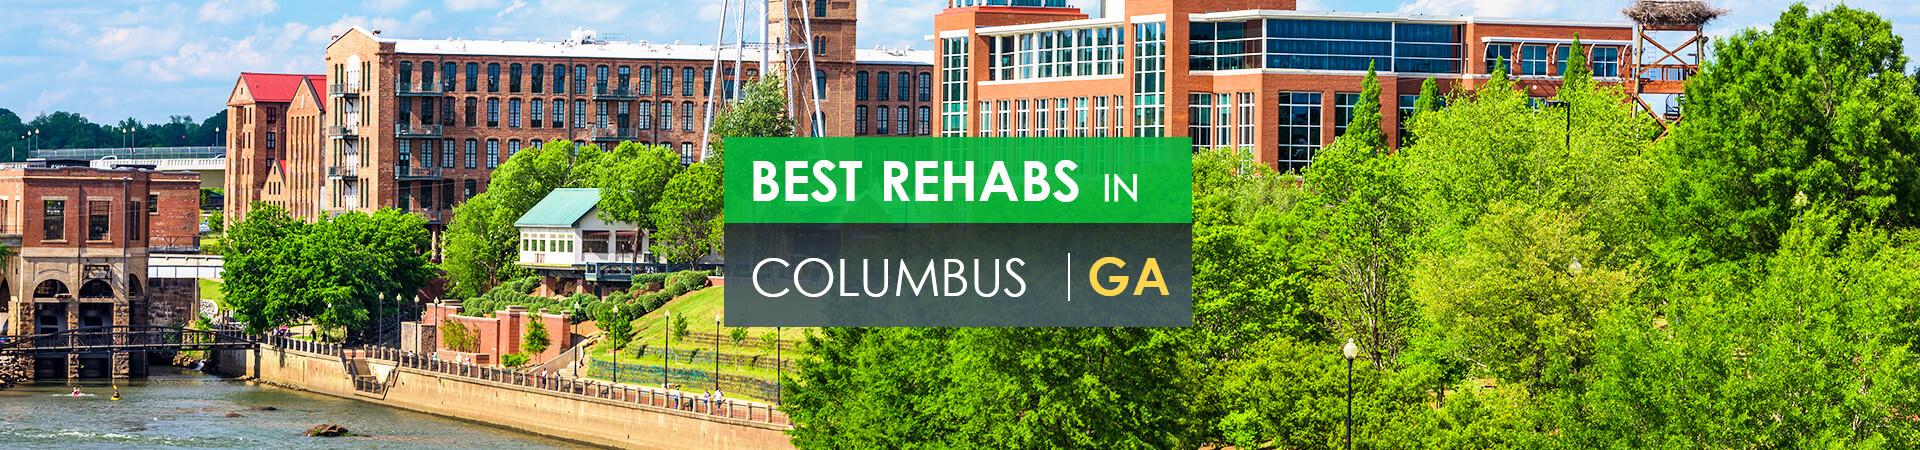 Best rehabs in Columbus, GA